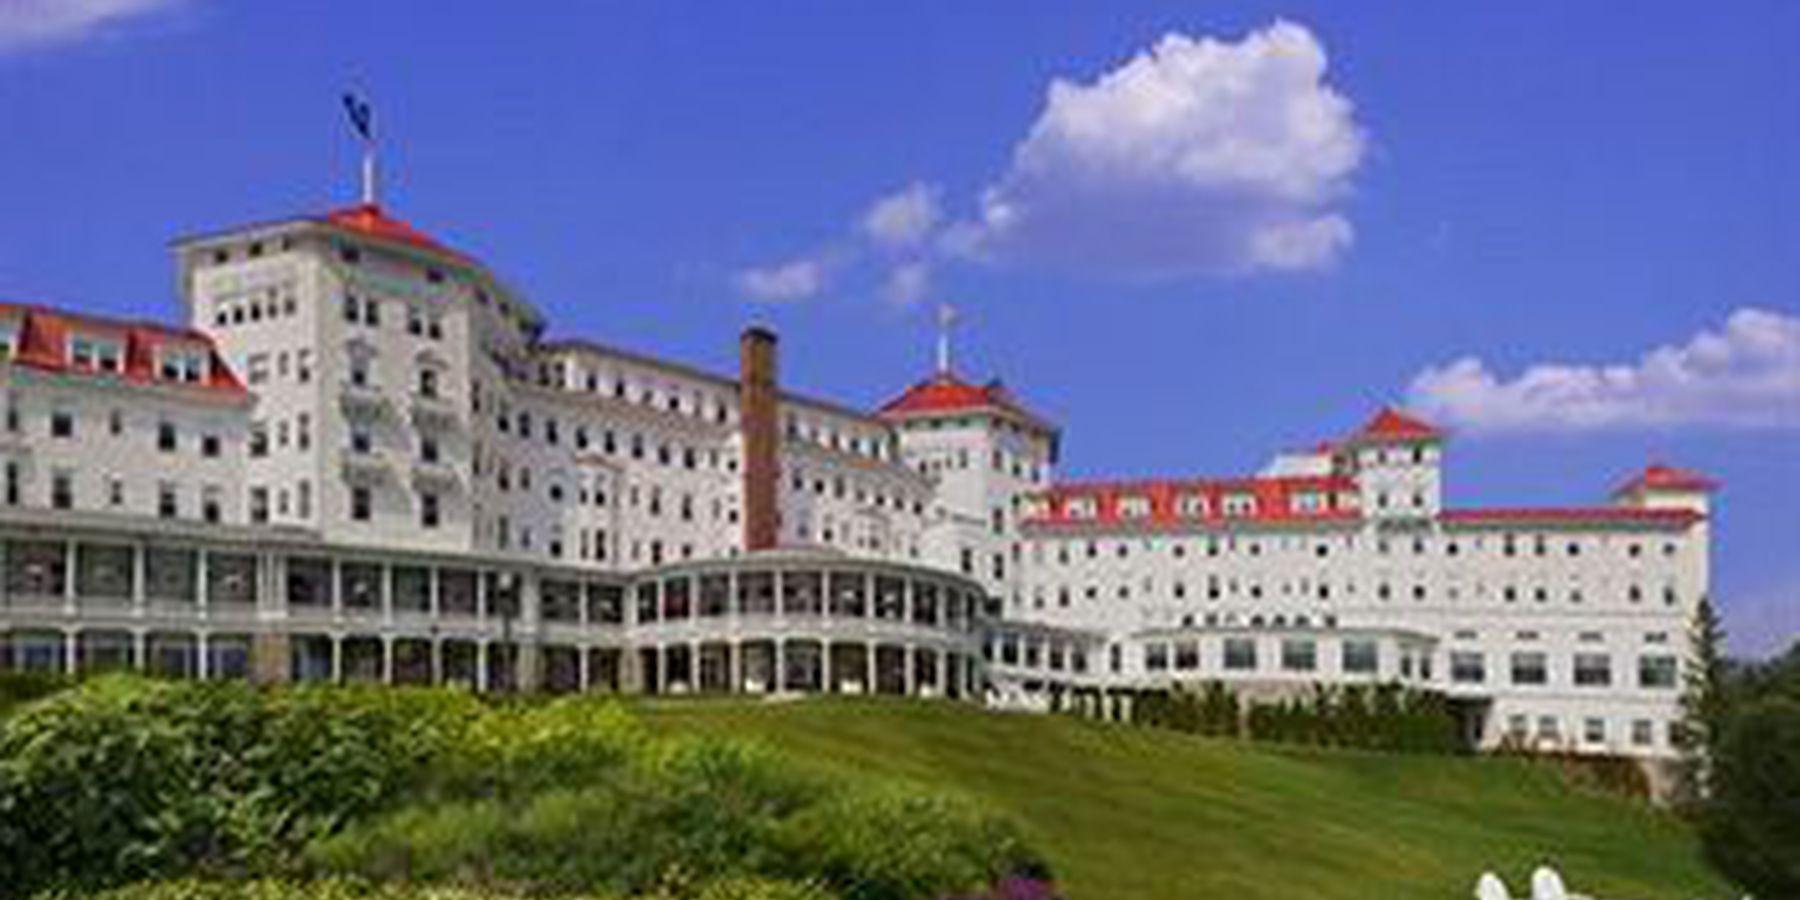 Omni Mount Washington Hotel - vooraanzicht